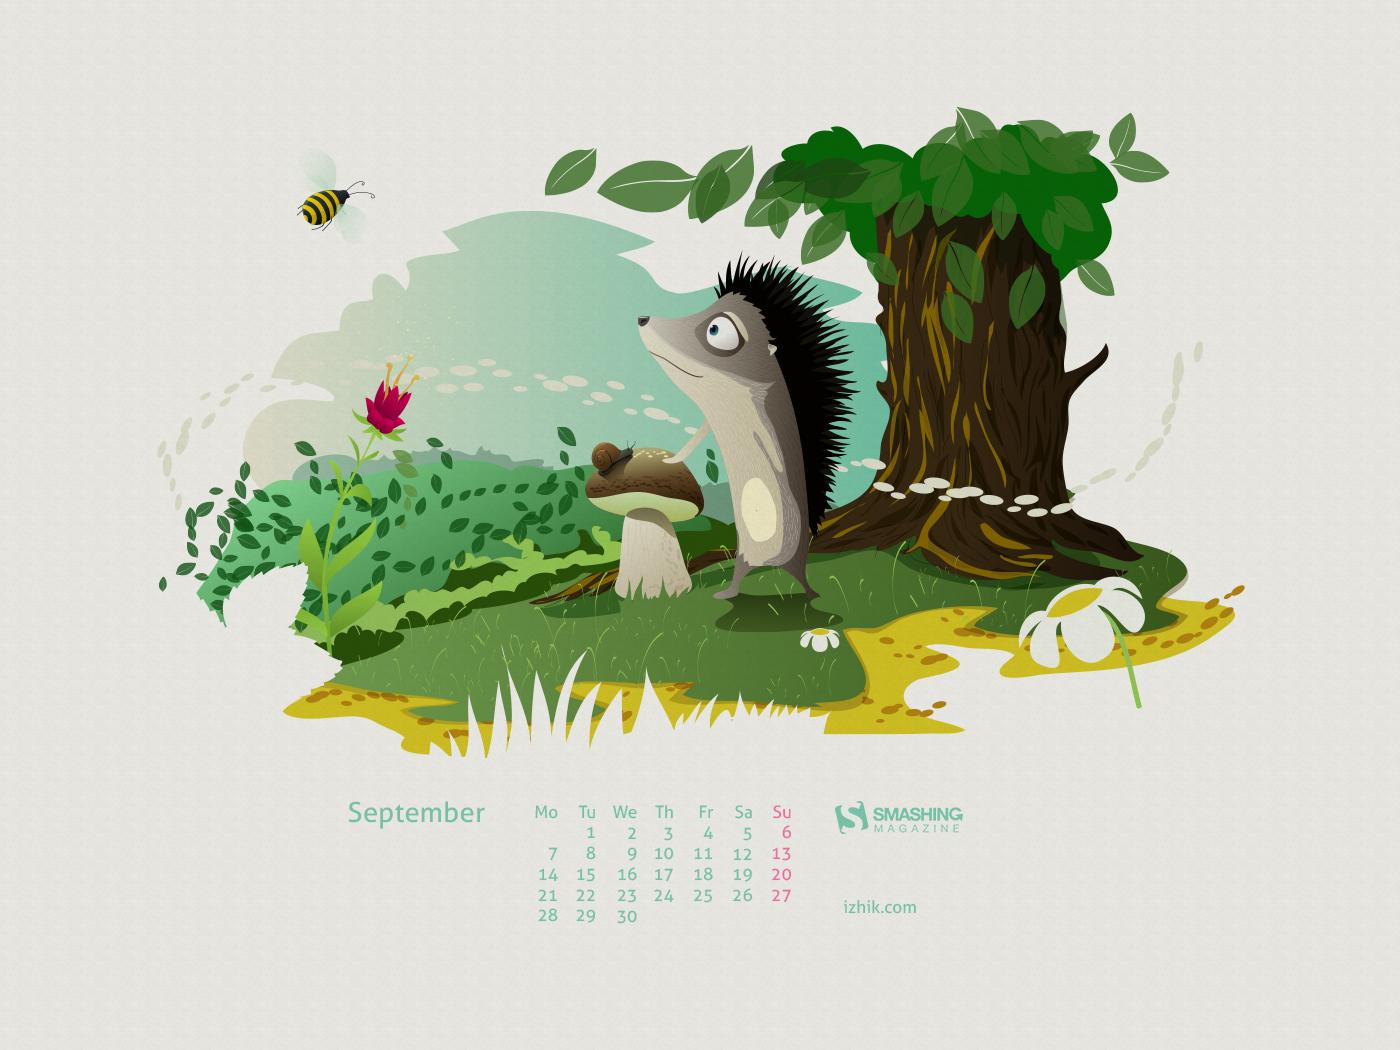 Calendar Wallpaper Smashing Magazine : Desktop wallpaper calendars september — smashing